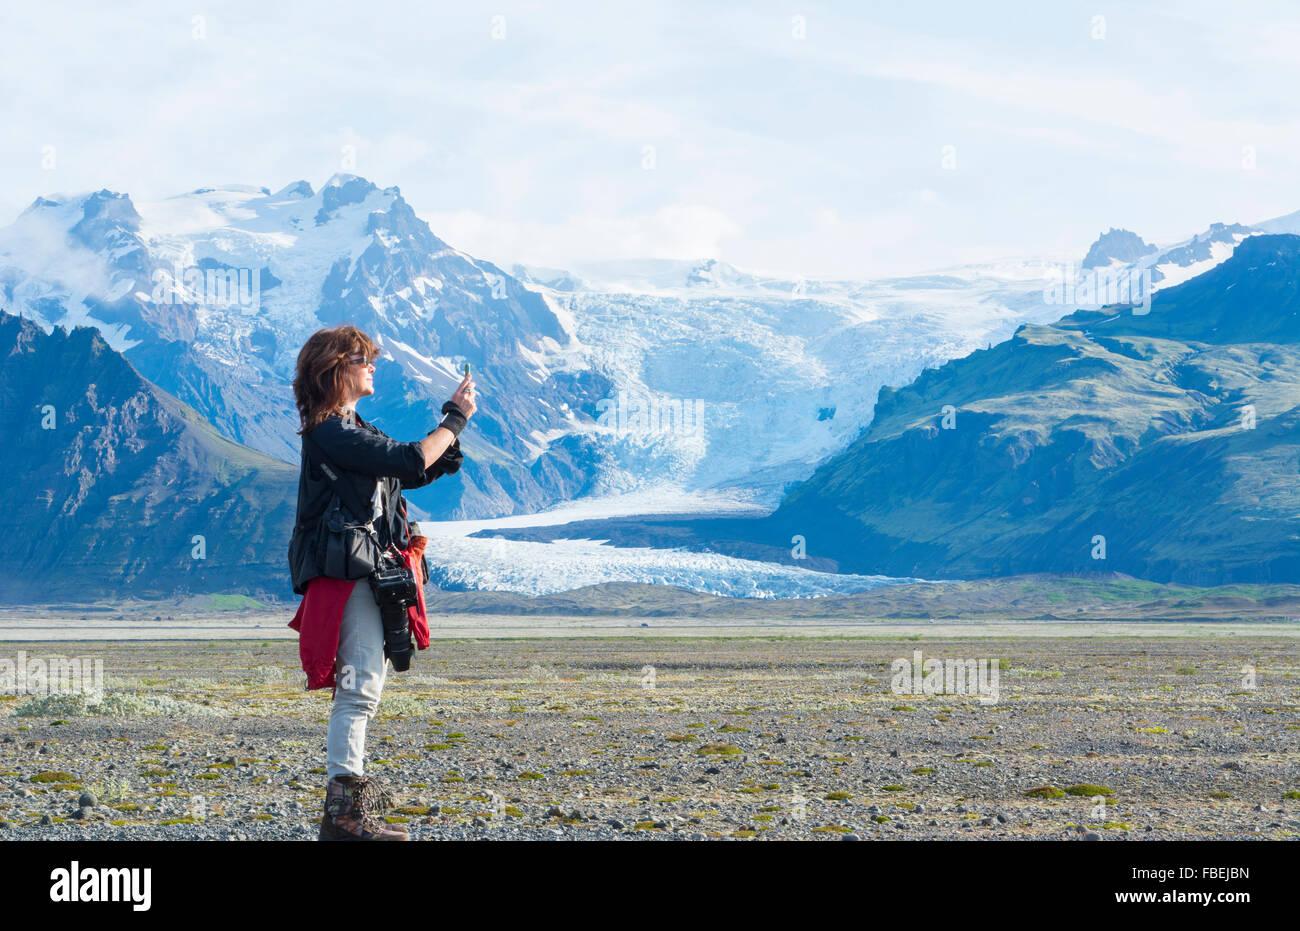 Iceland majestic glaciers with snow called Svinafellsjokull on right and Skaftafellsjokill in Skaftafell National - Stock Image